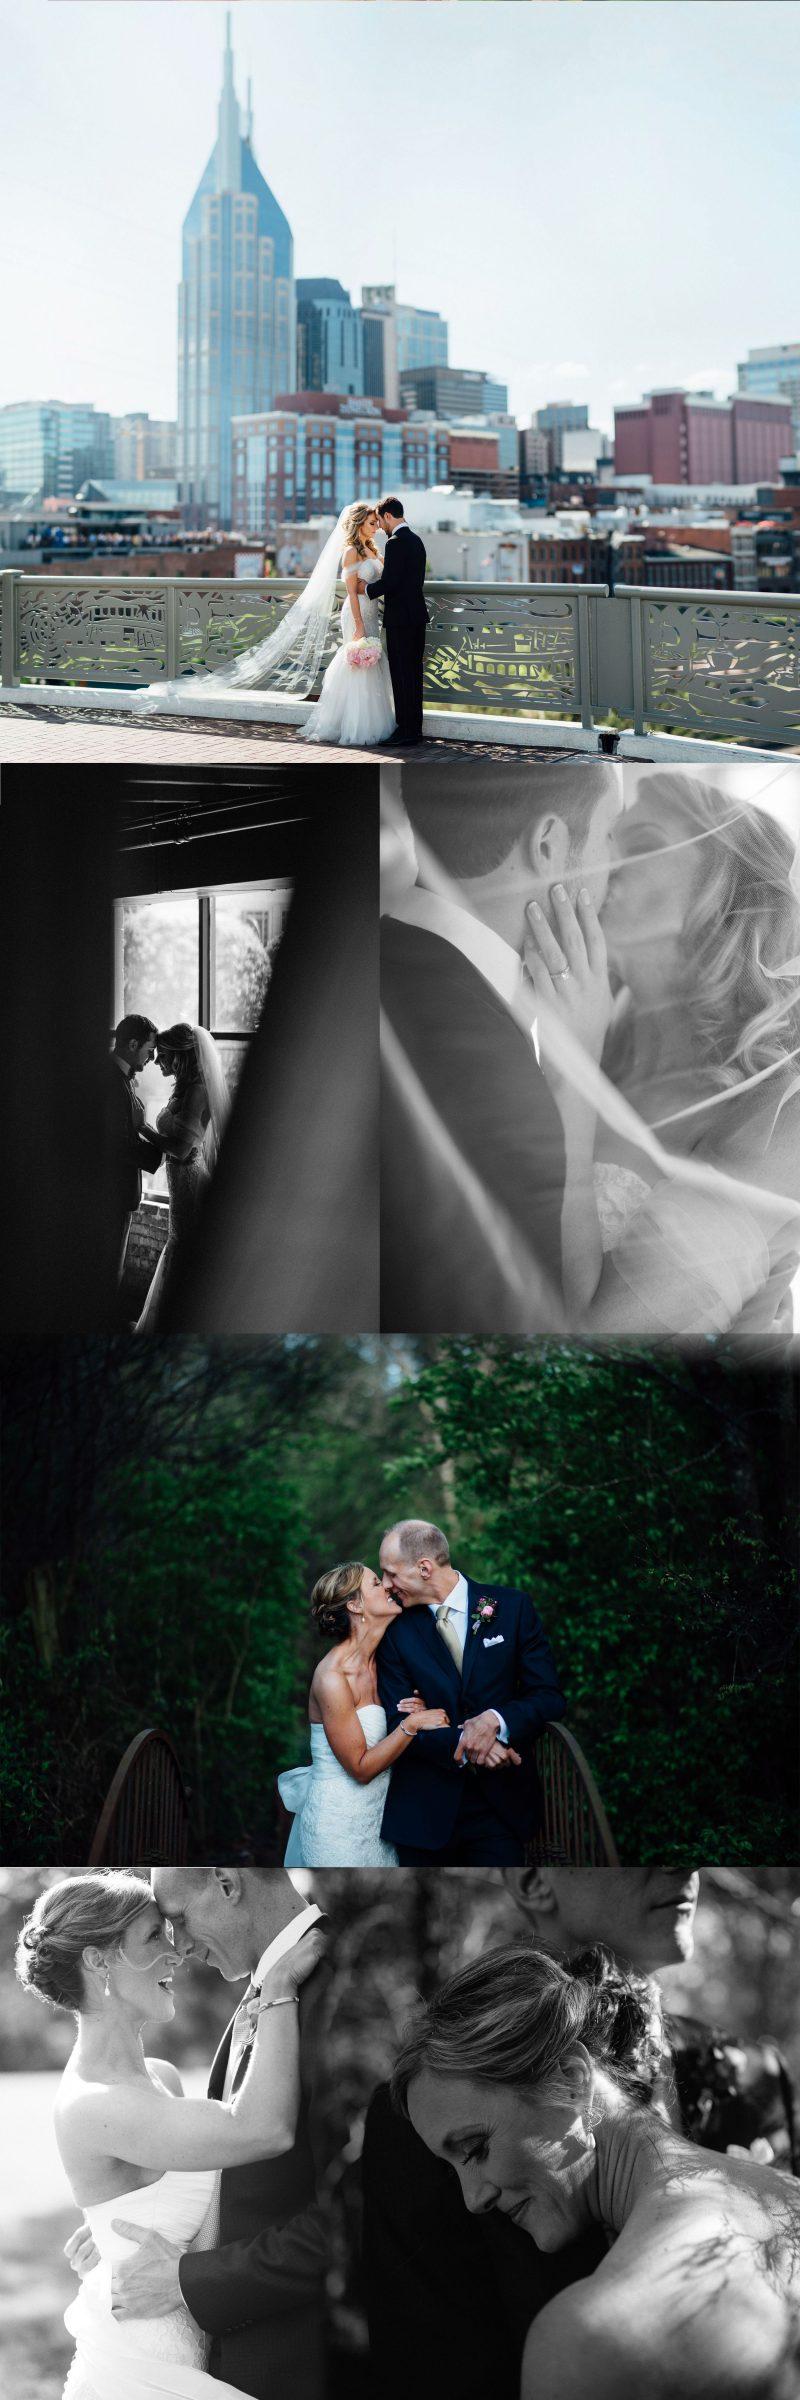 instagram-2-800x2400 Best of Weddings 2016